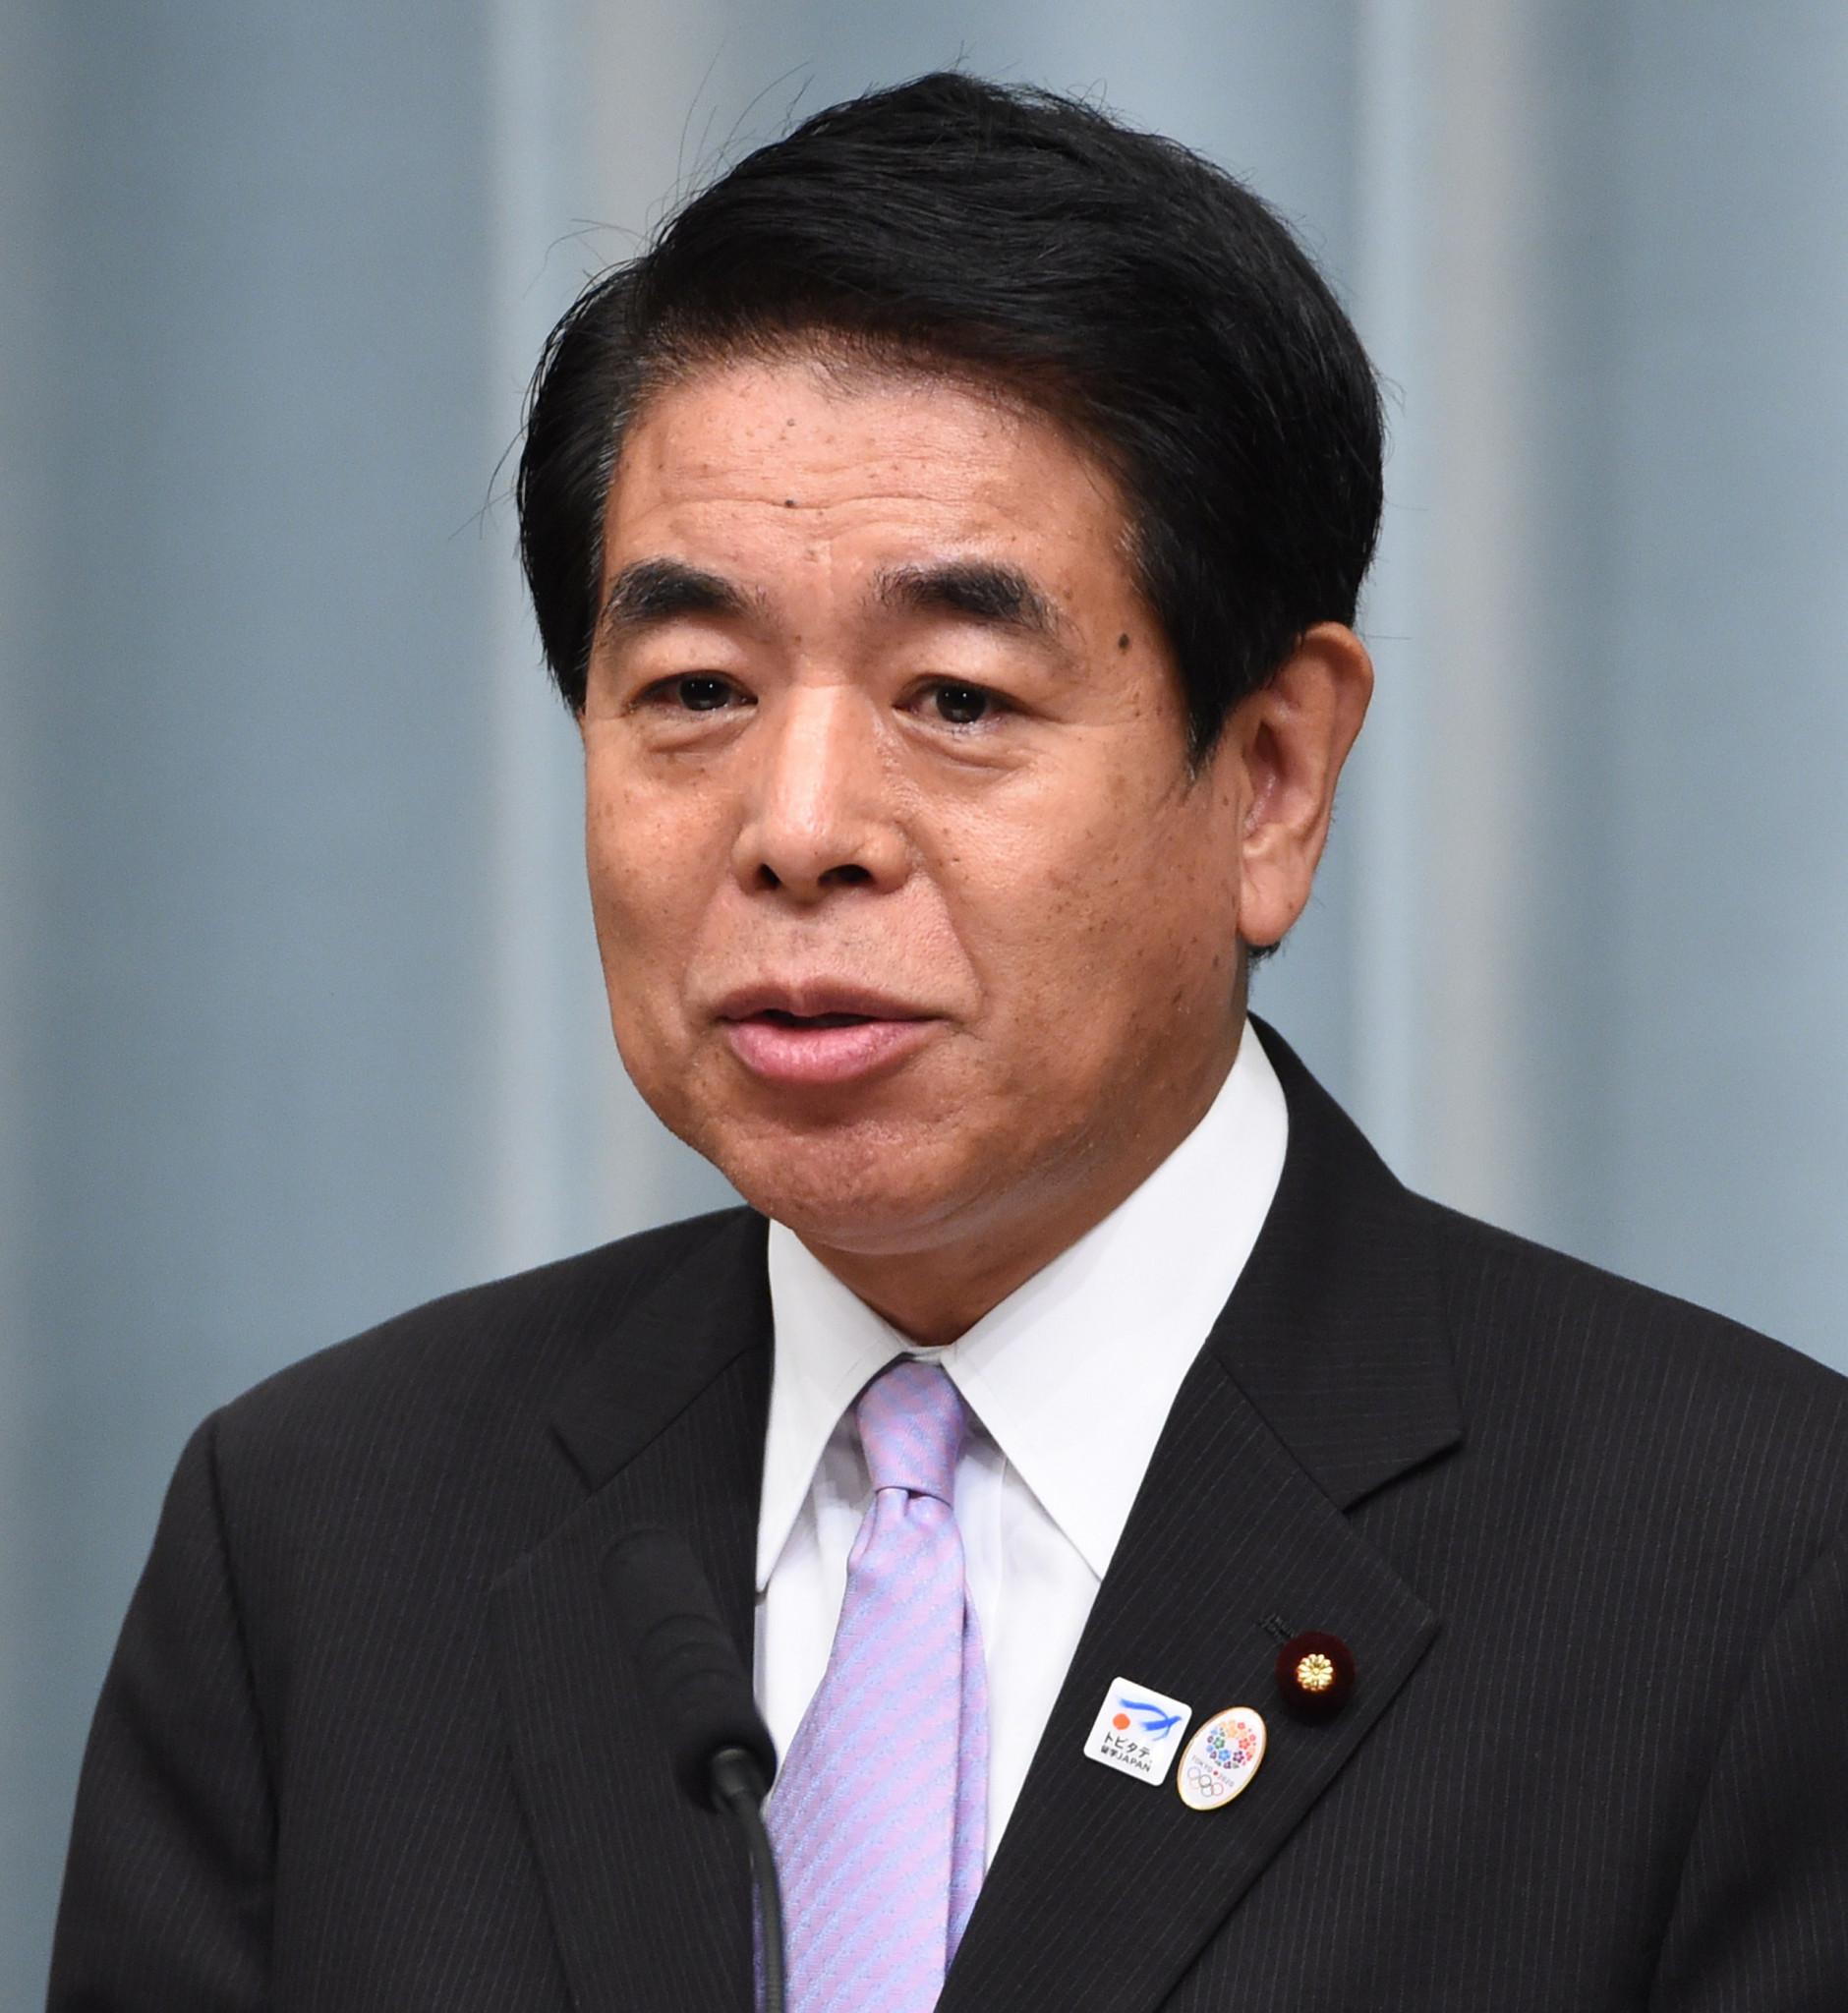 Senior Japanese politician calls for decision on Tokyo 2020 spectators before Bach visit